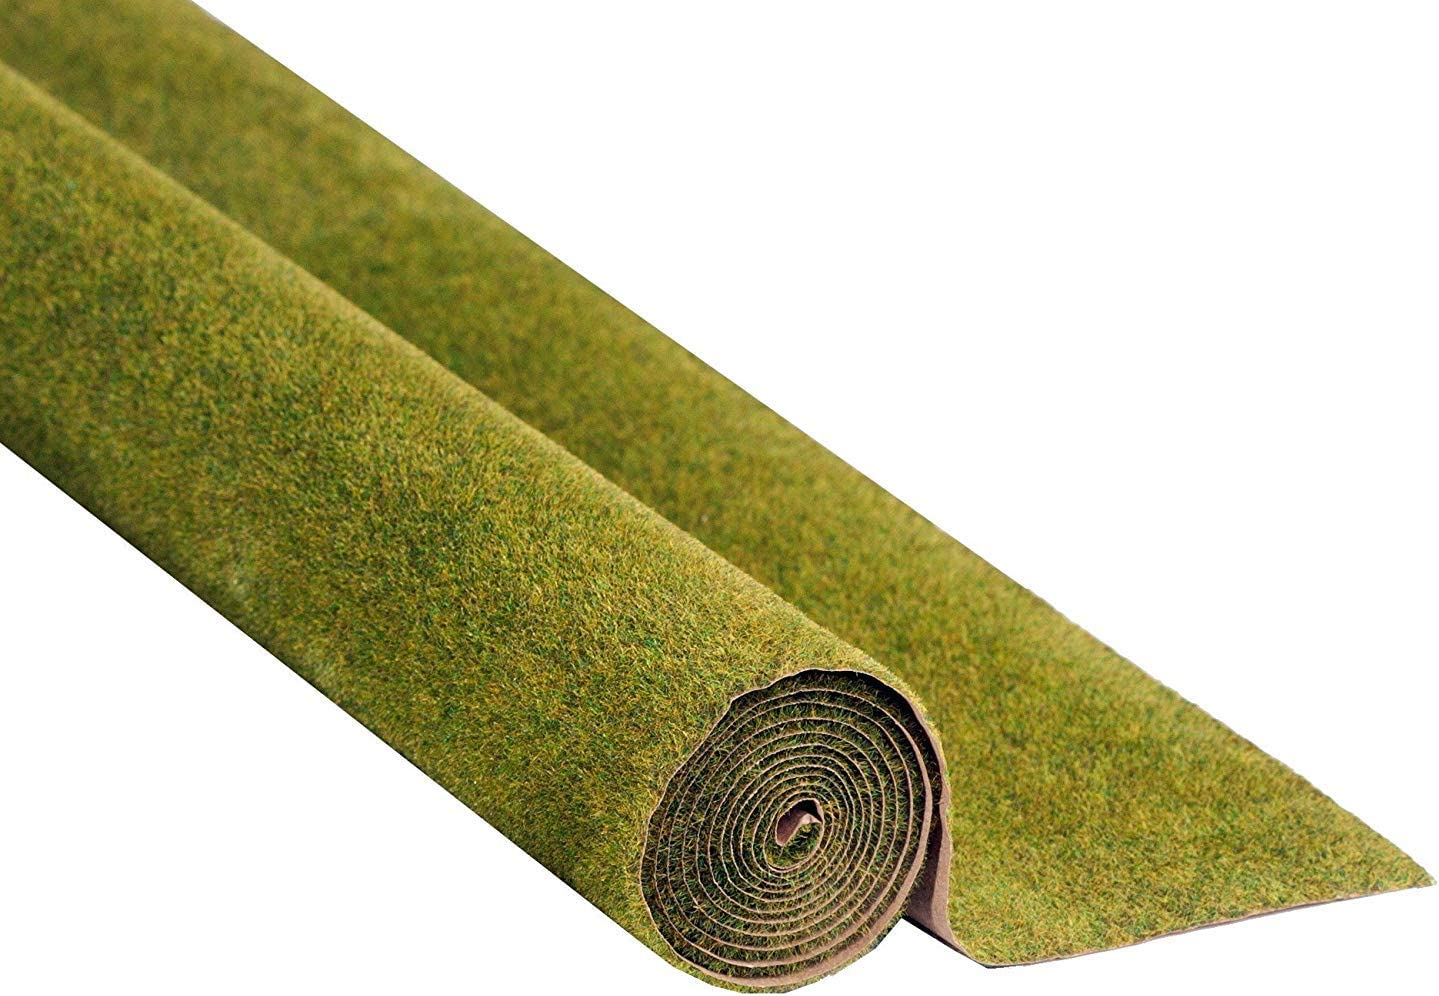 Tappeto manto erboso verde estivo 120 x 60 cm NOCH 00280